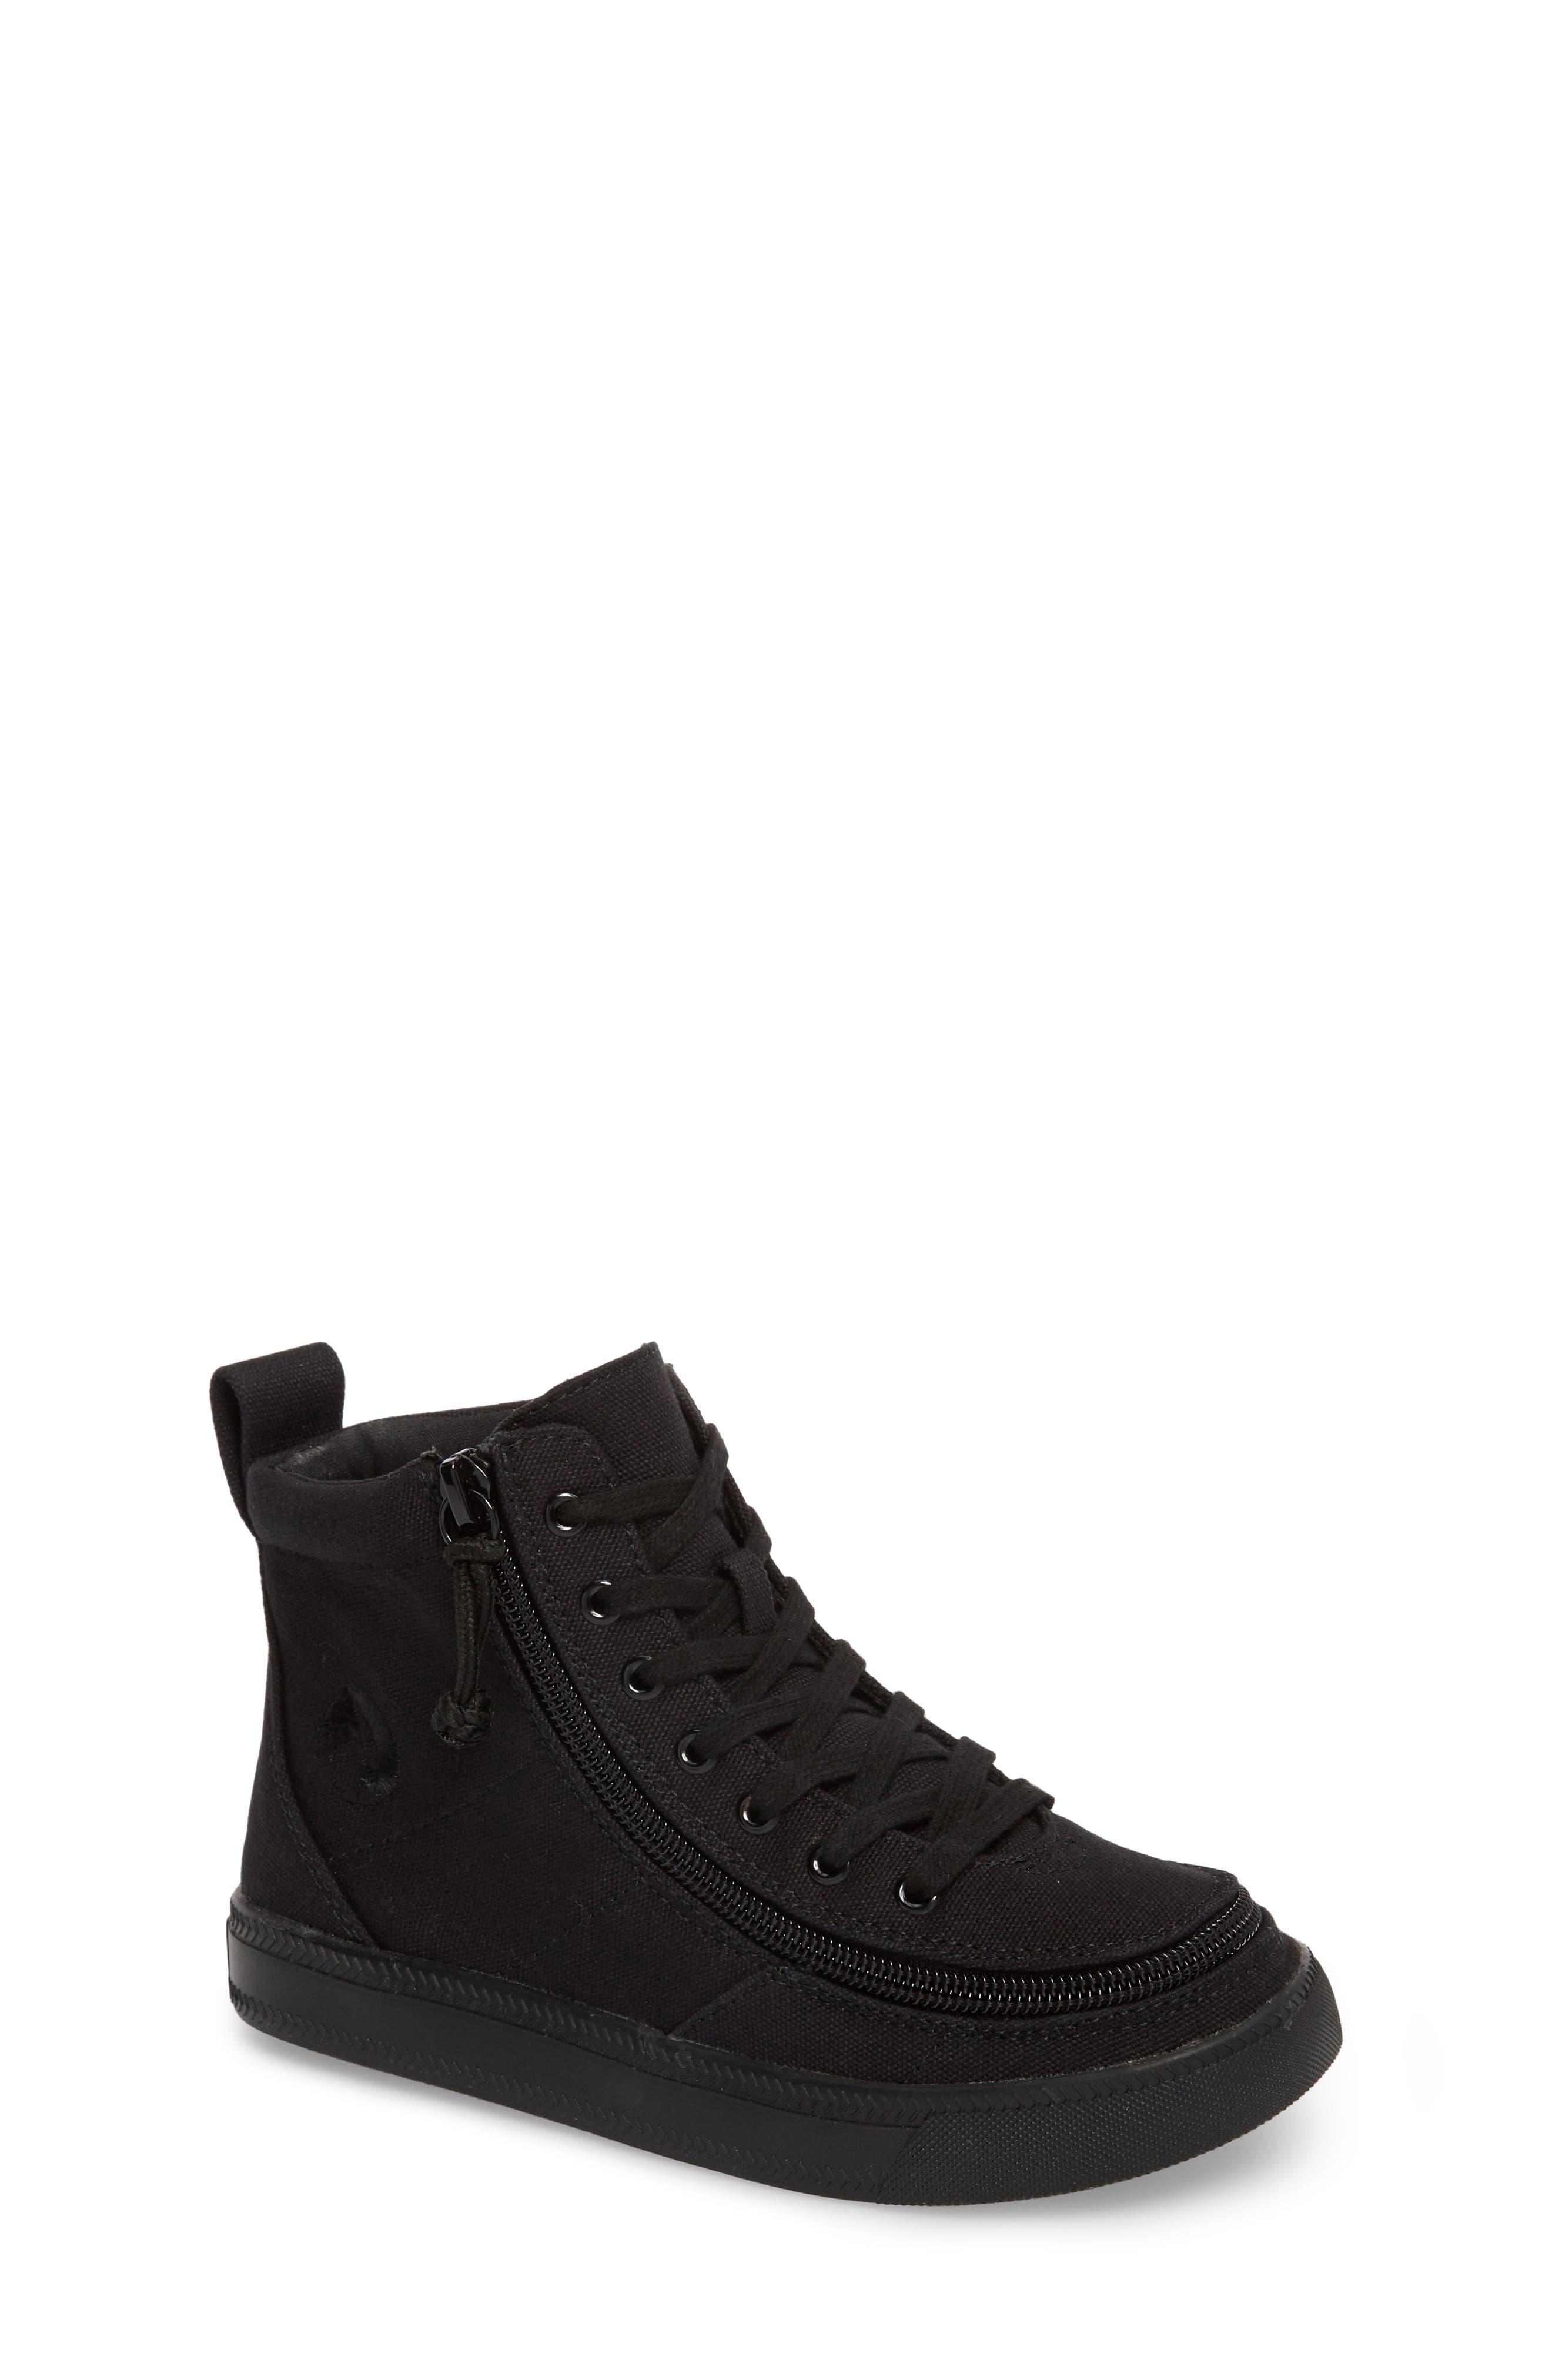 BILLY Footwear Classic Hi-Rise Sneaker (Toddler, Little Kid & Big Kid)